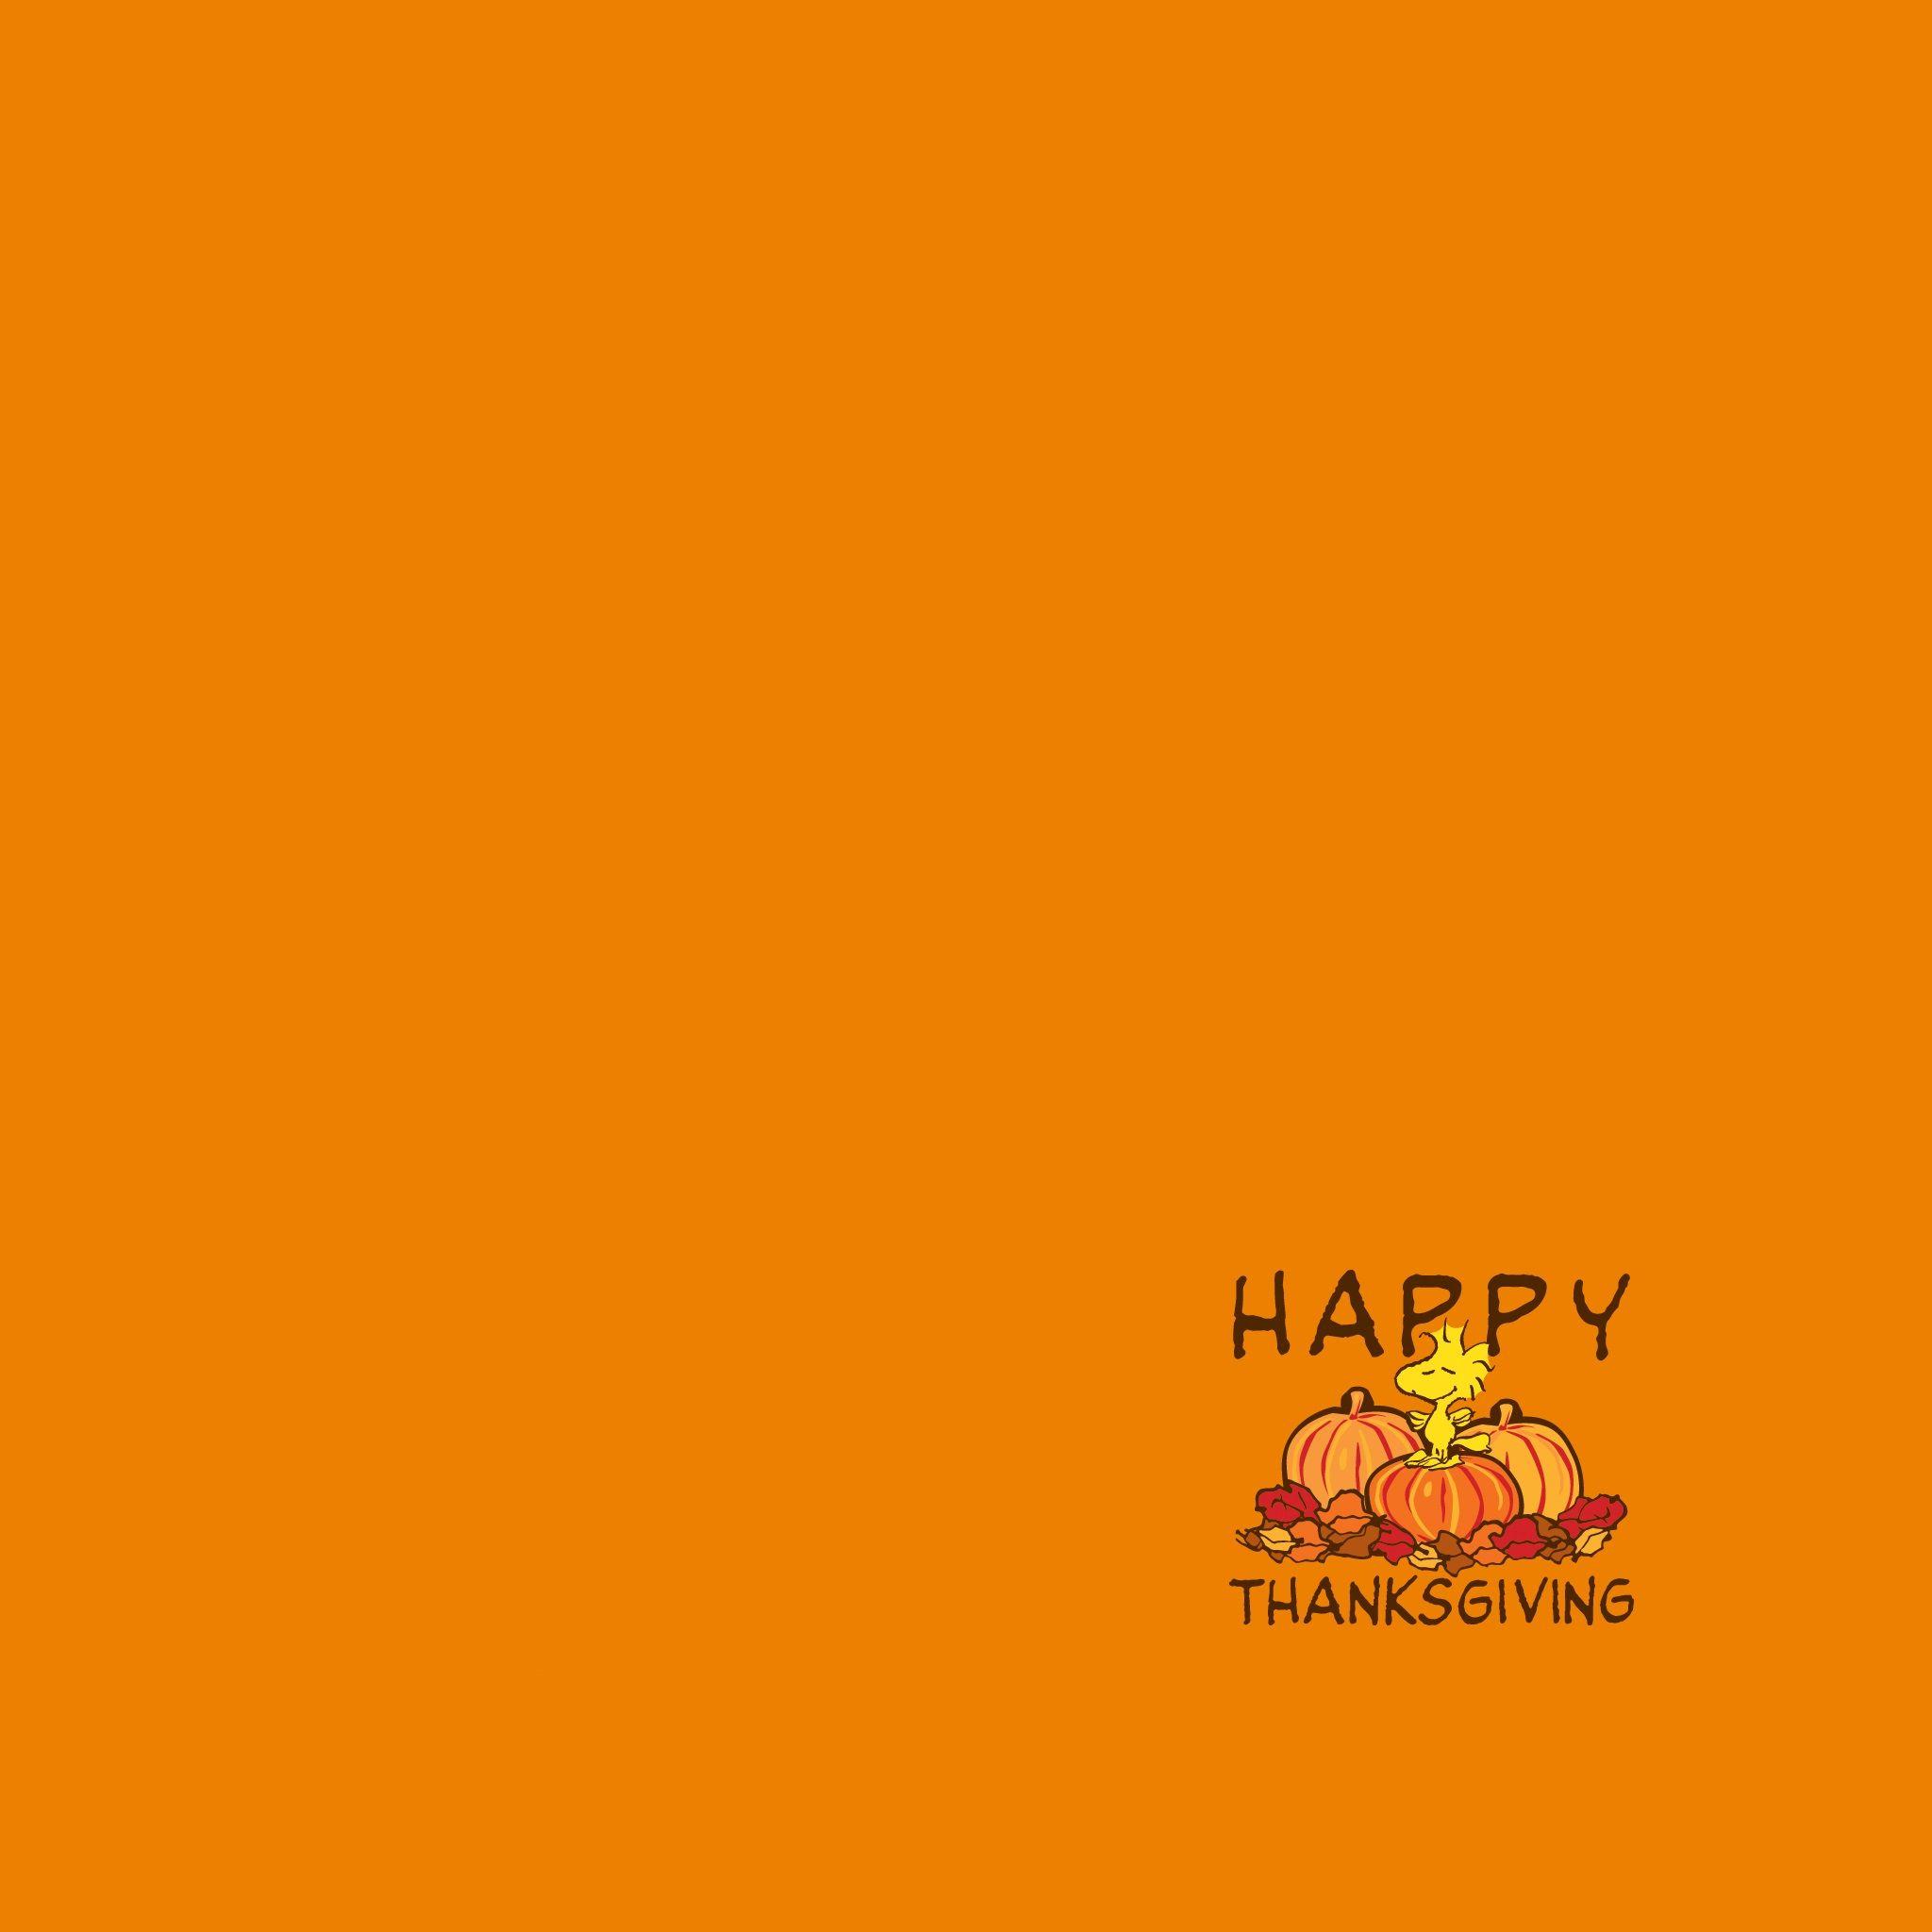 Happy Thanksgiving Http Ipadretinawallpaper Com Gallery Php Cat Thanksgiving Retina Wallpaper Thanksgiving Wallpaper Happy Thanksgiving Wallpaper